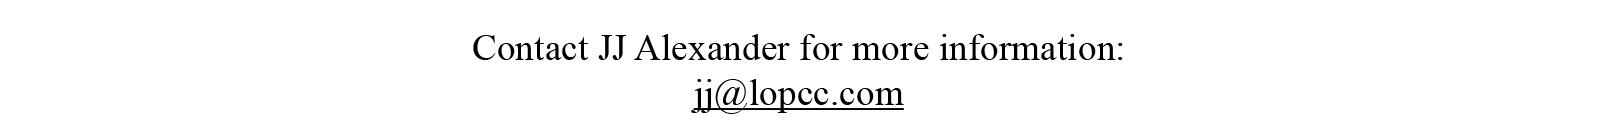 Contact JJ Alexander for more information: jj@lopcc.com